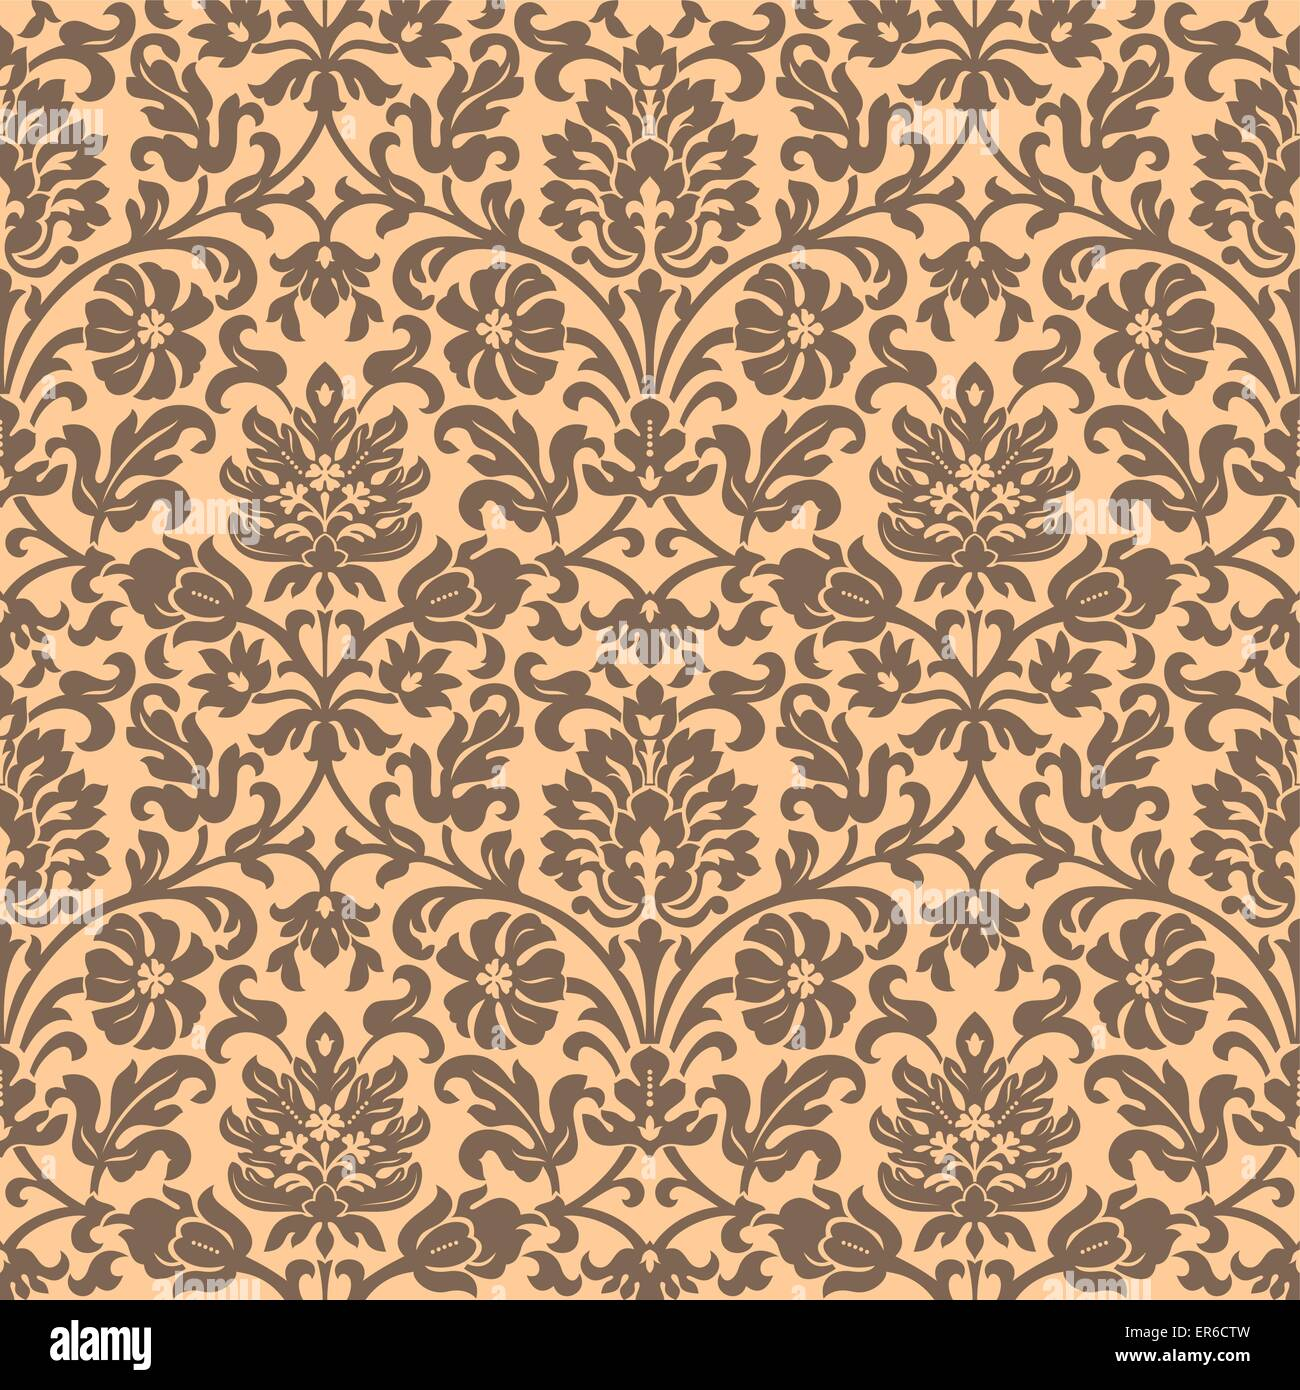 Golden-sand seamless vintage wallpaper pattern. Vector image. - Stock Image